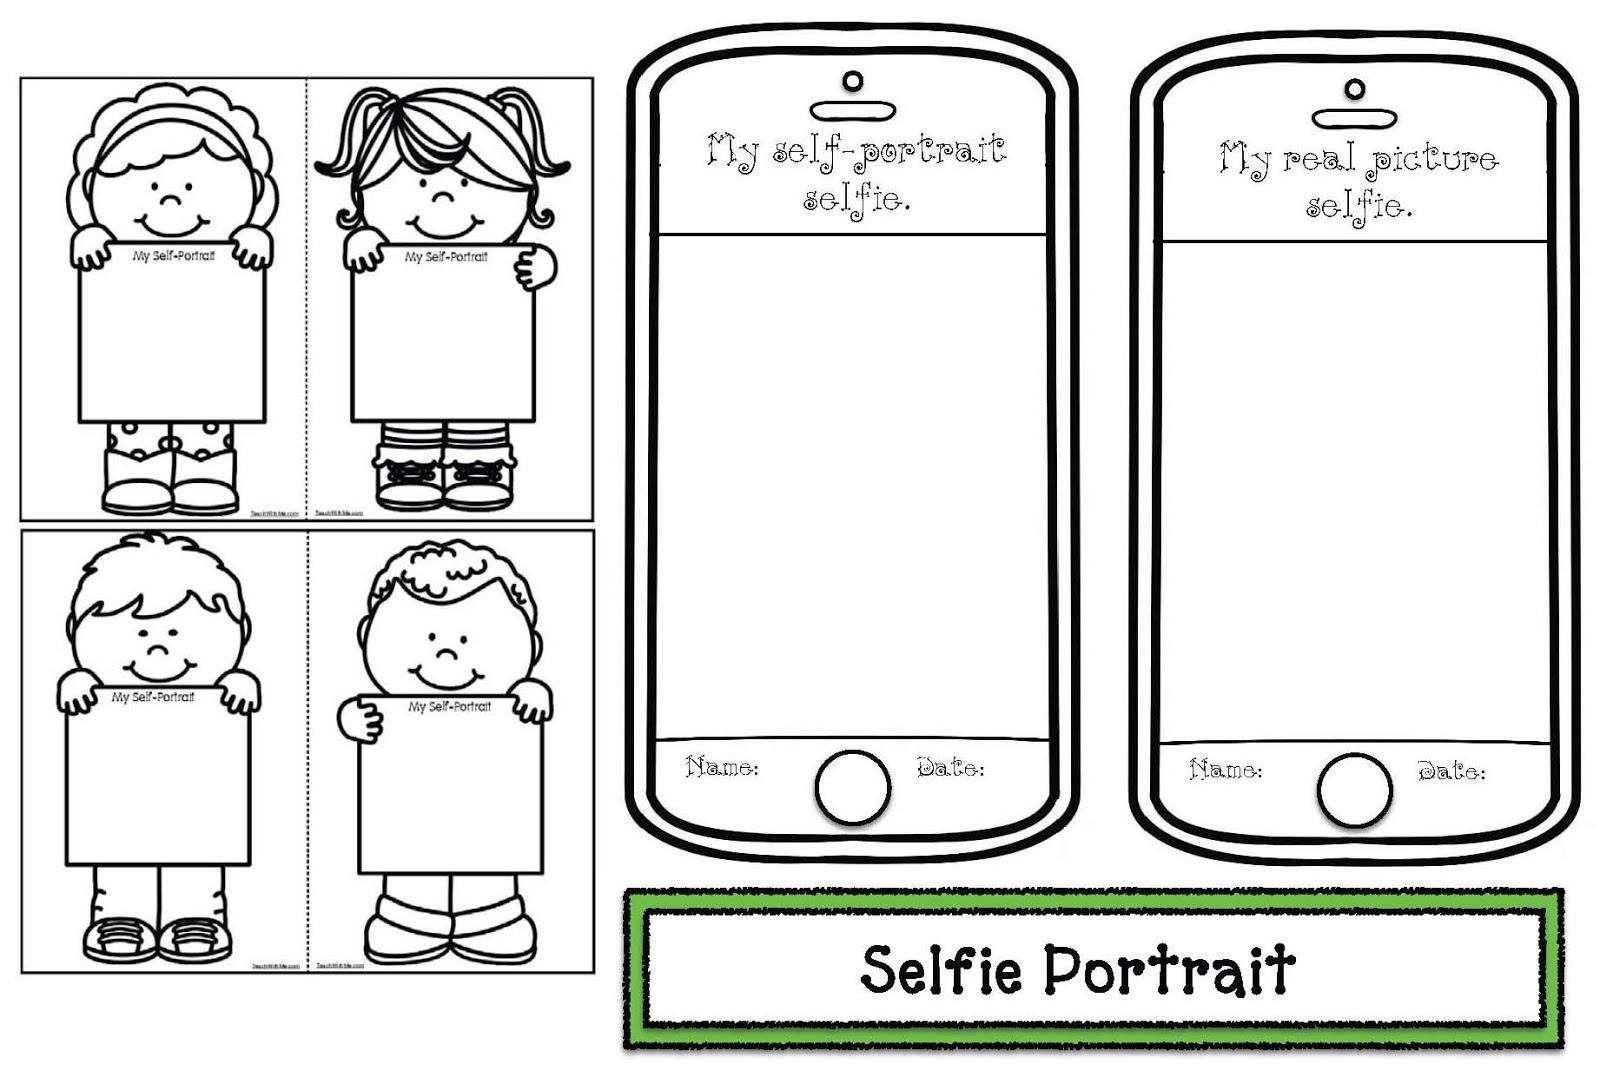 My Selfie Craftivity Packet